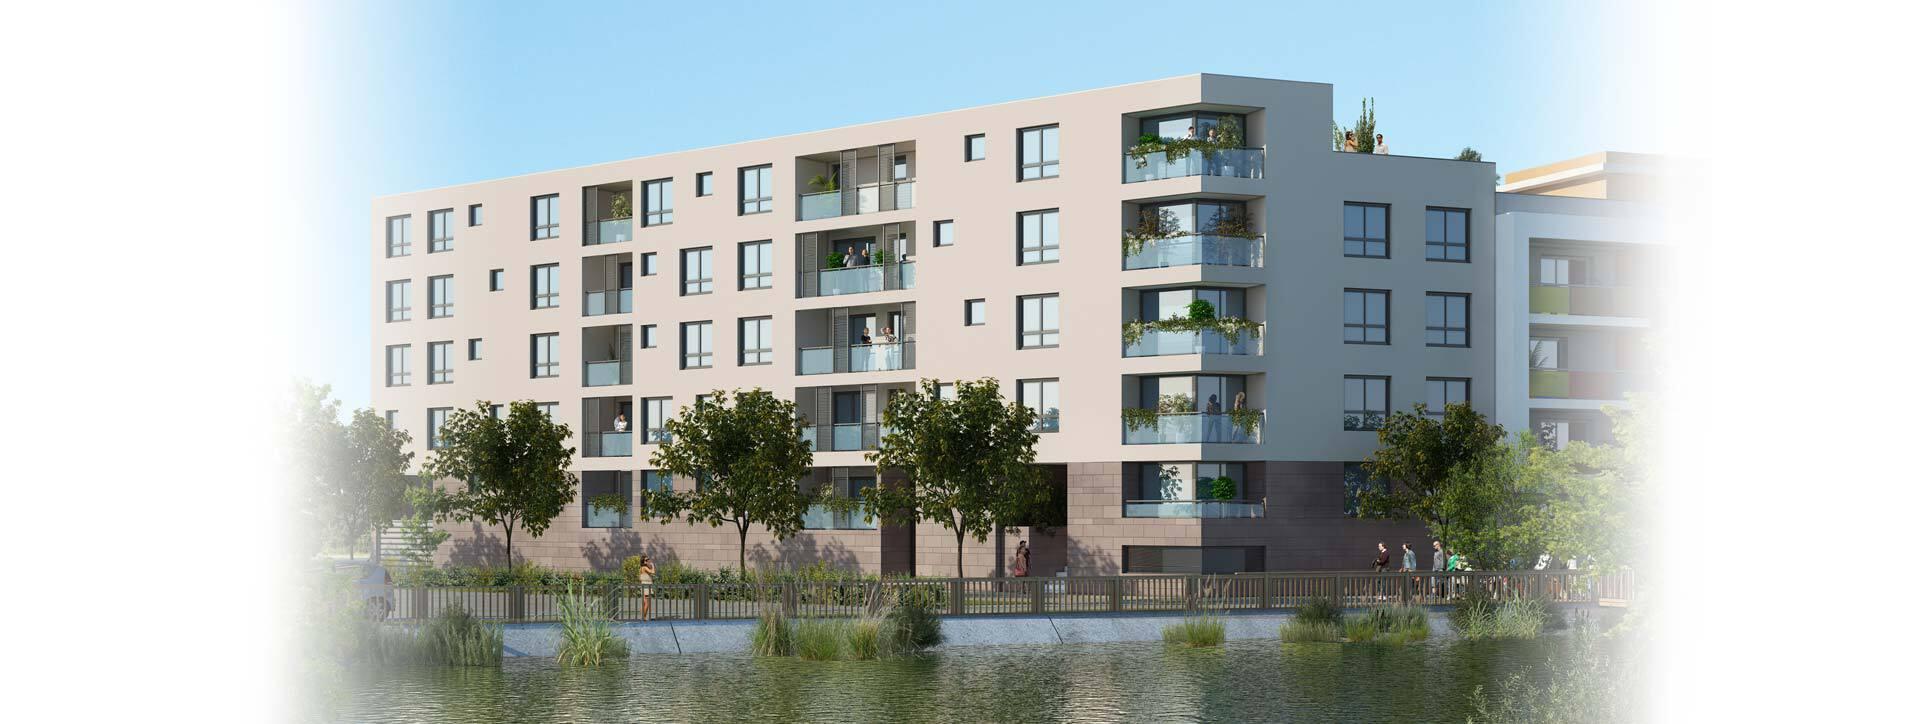 Appartements les Jardins de l'Arsenal